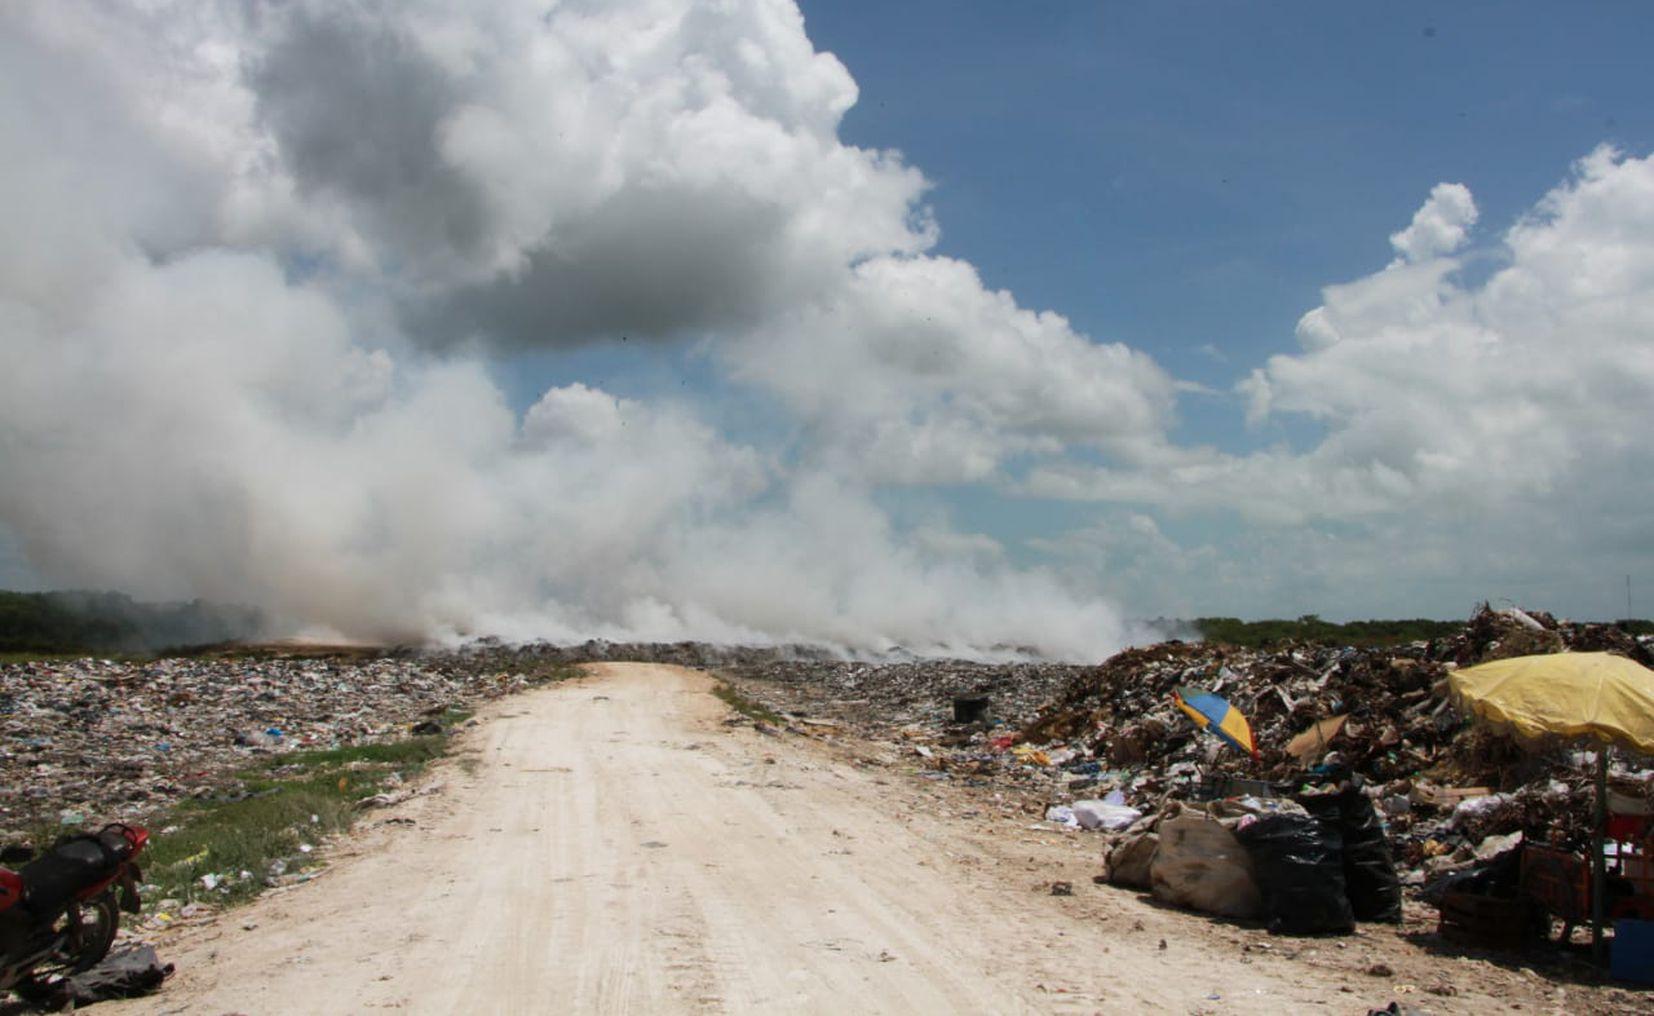 ¡De nuevo! Se registra incendio en basurero de Chetumal